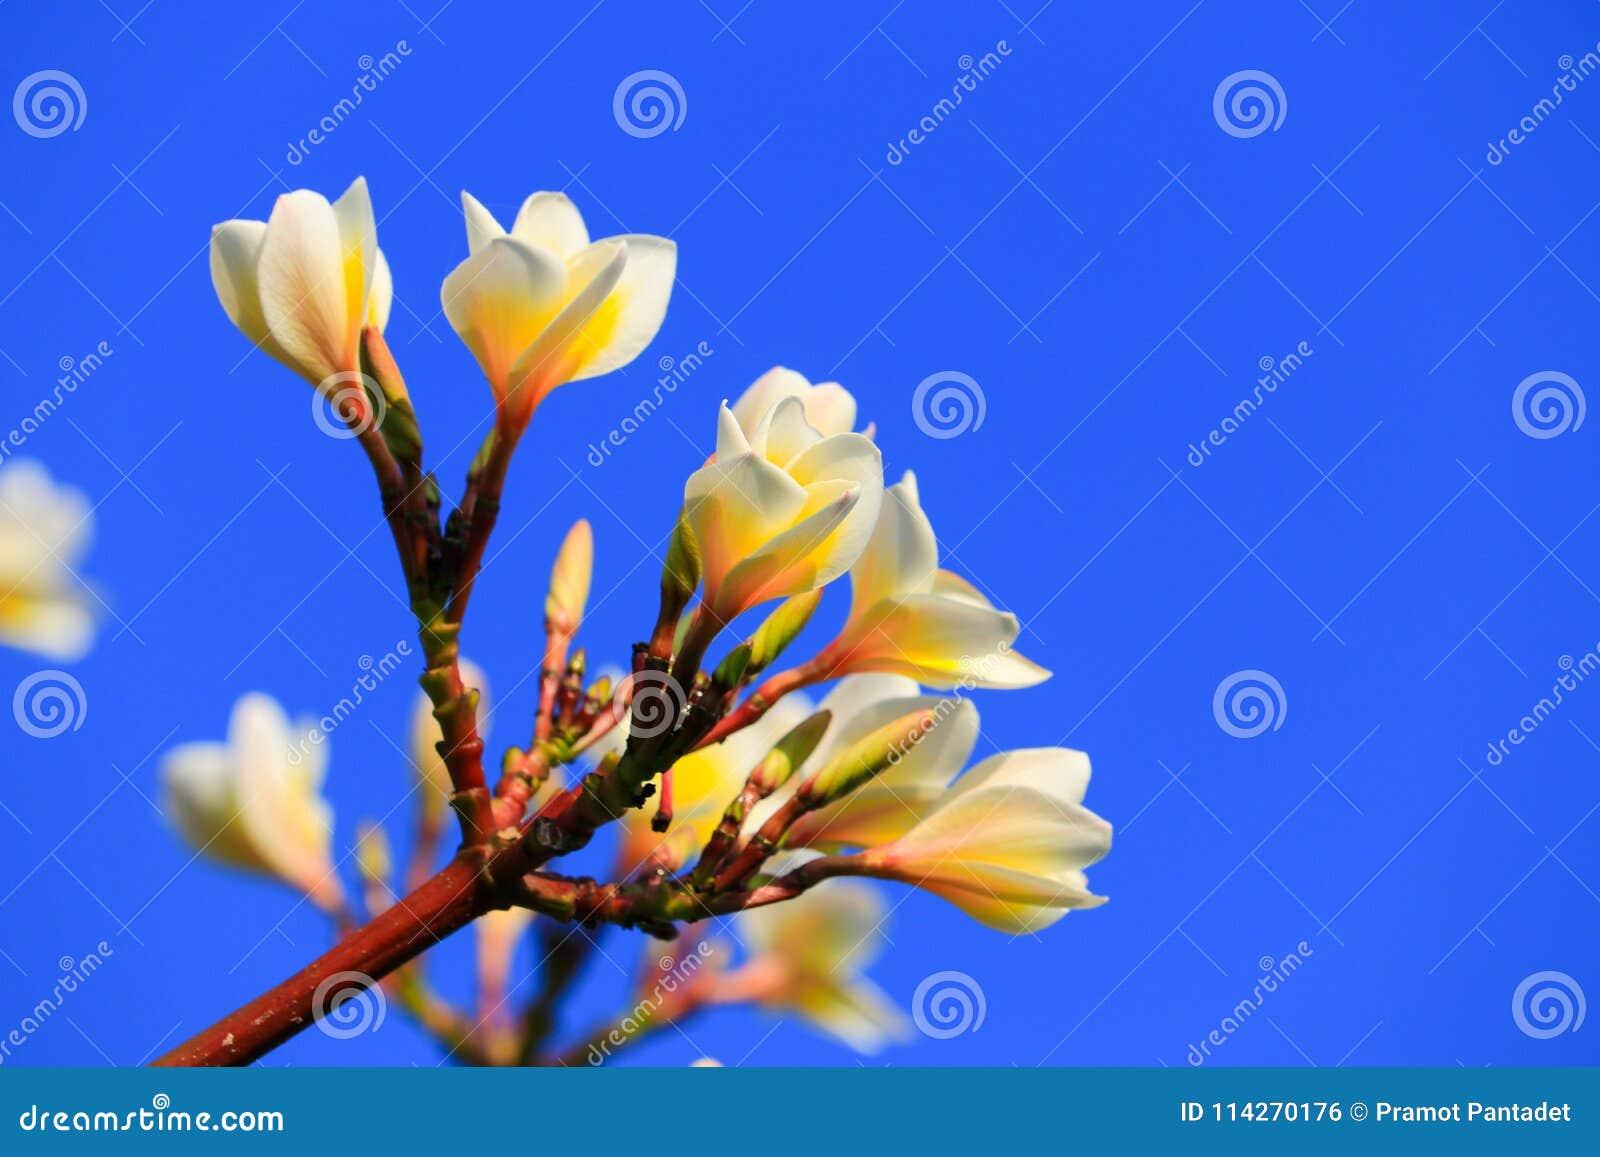 Plumeria Flower White And Pollen Yellow Beautiful On Tree Sky Ba